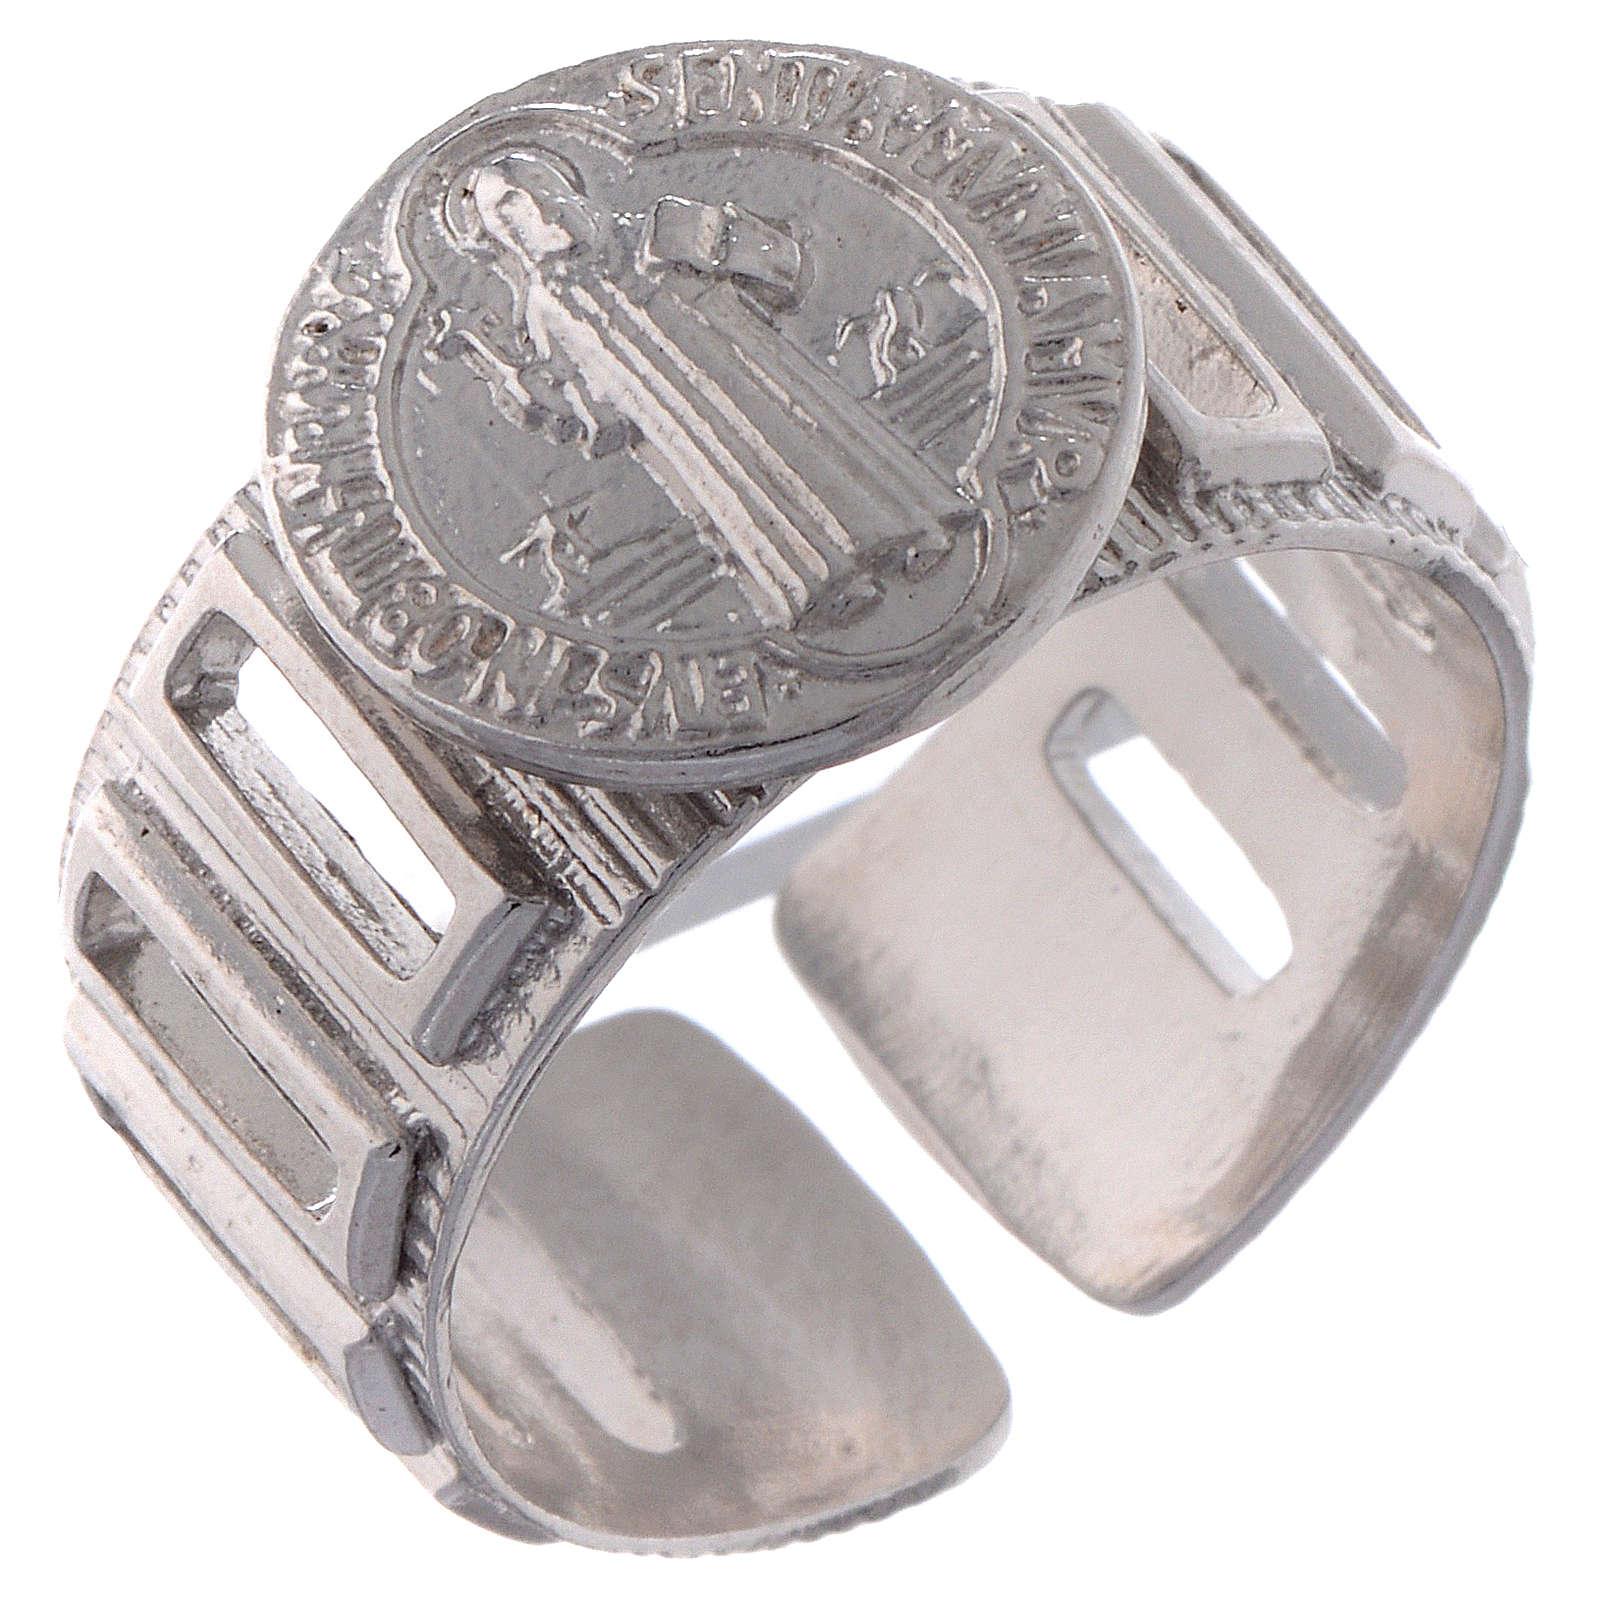 Saint Benedict ring in 925 silver adjustable 3